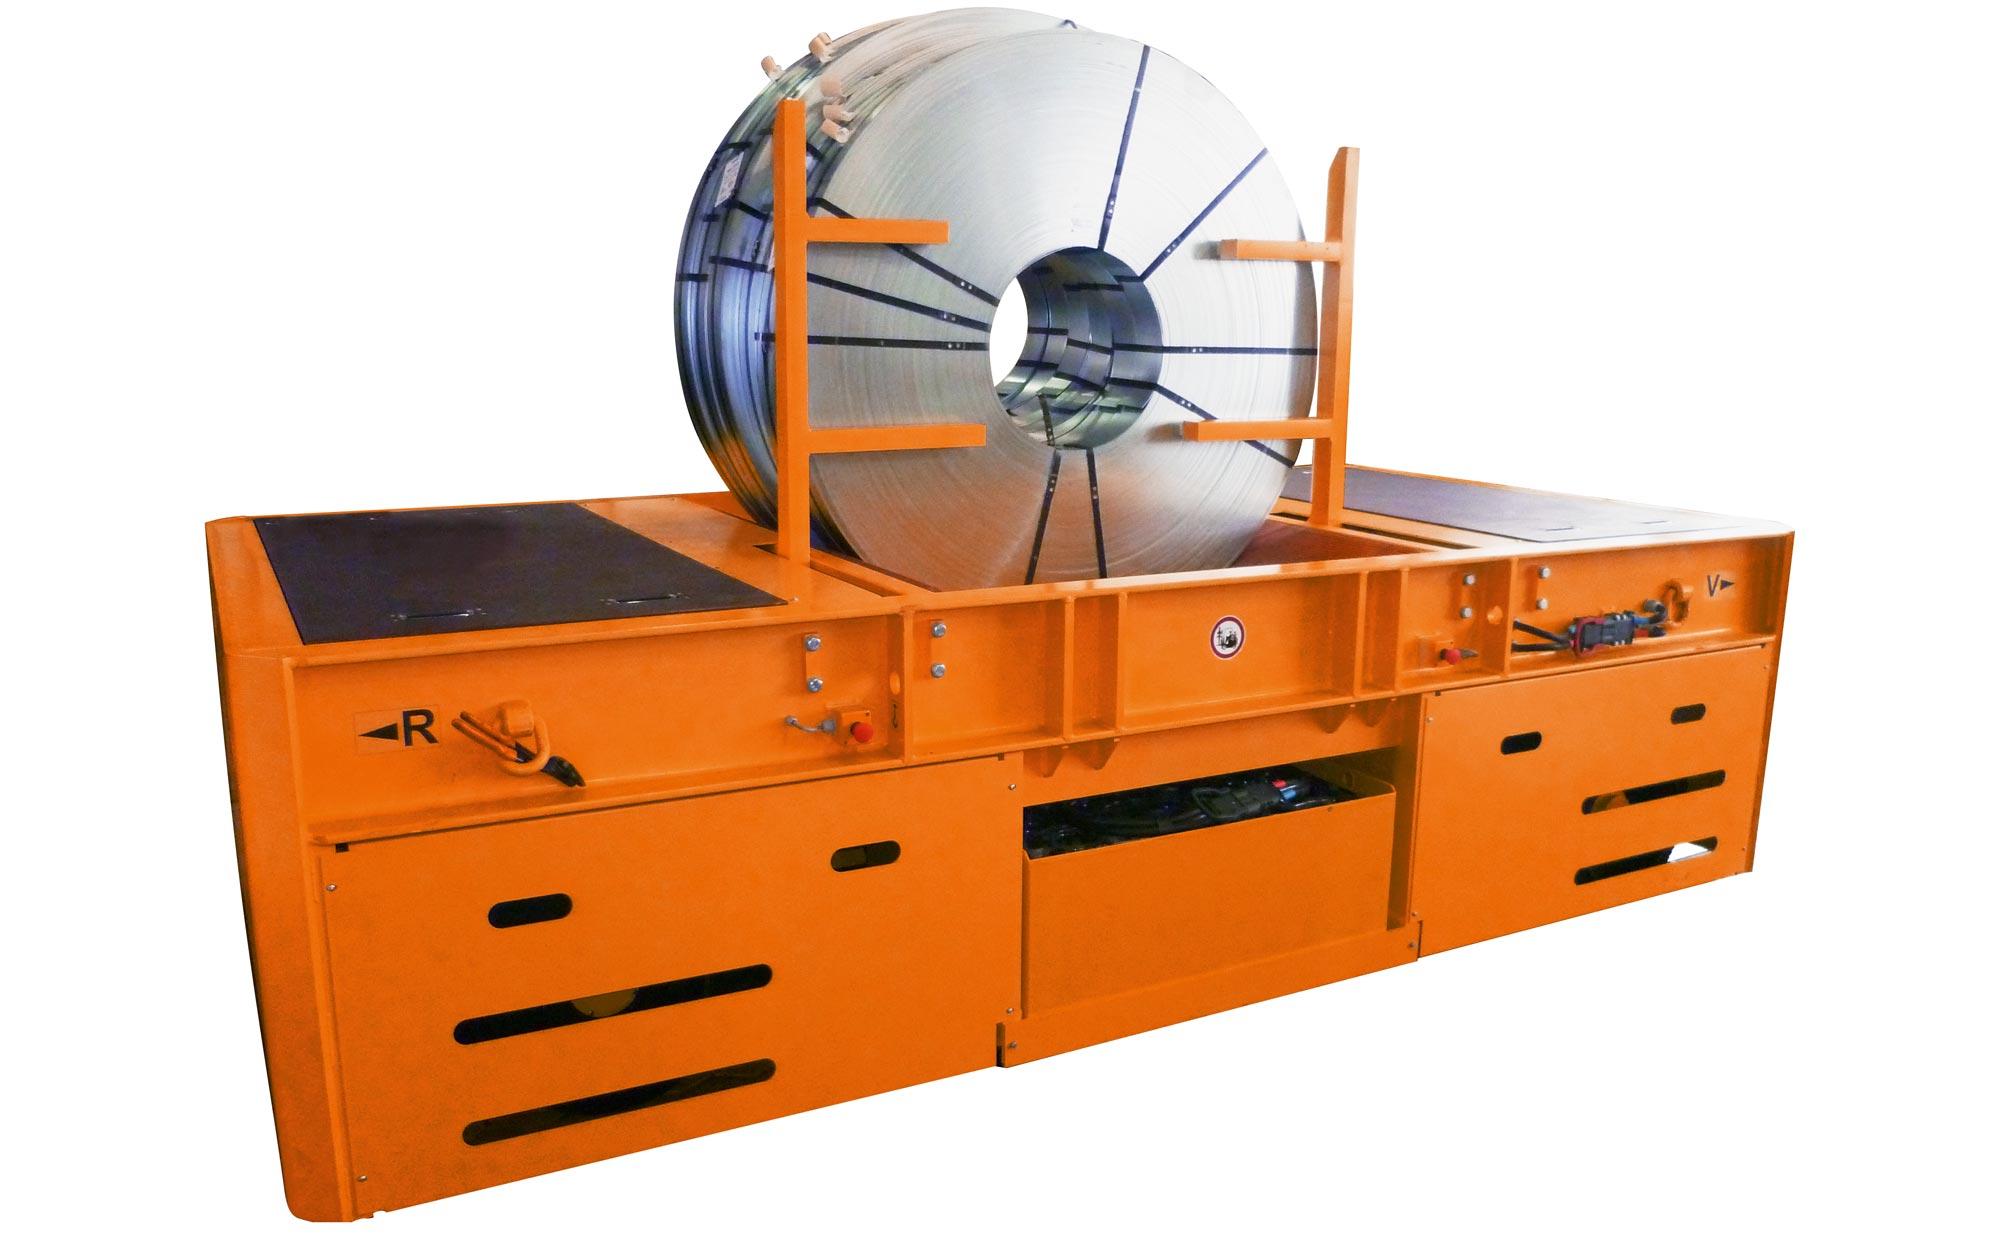 Hubtex AGV Coil Handler